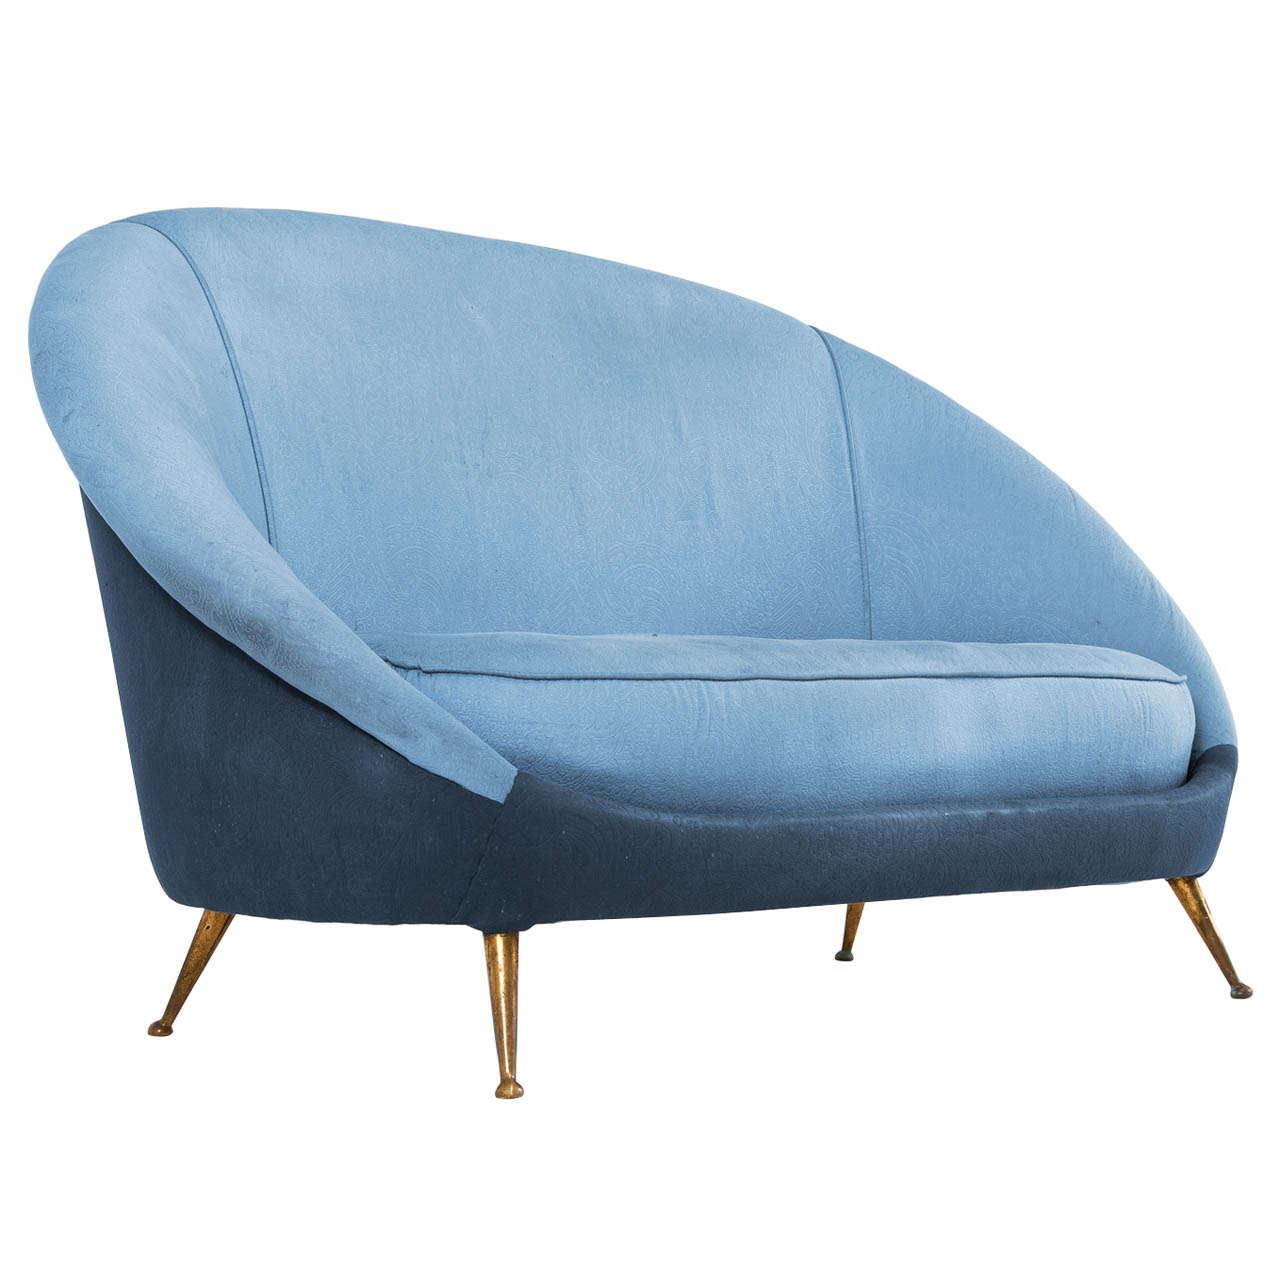 Charming Italian Duo Tone Two Seat Sofa With Brass Legs